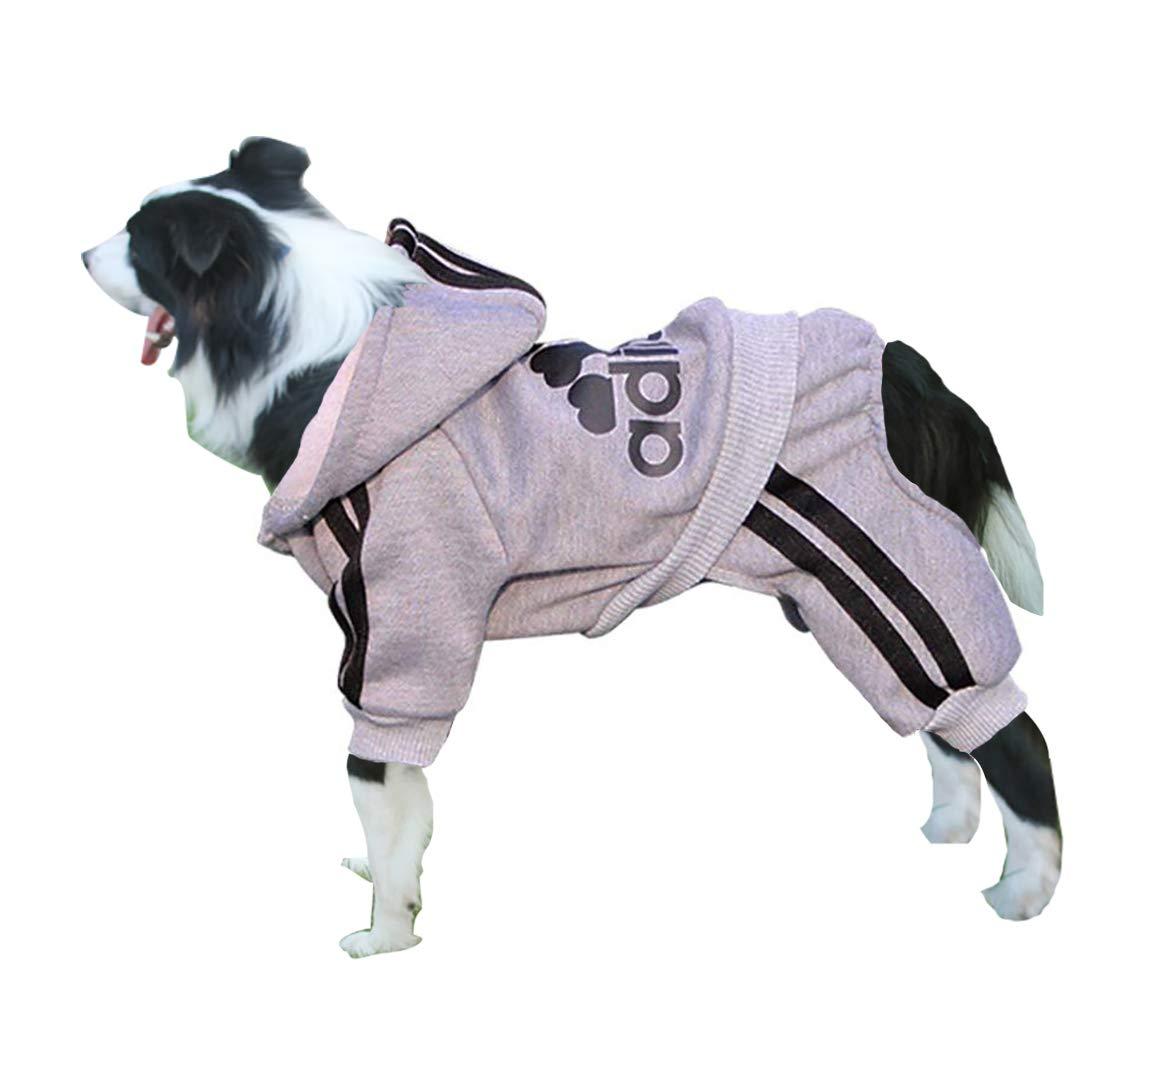 Rdc Pet Adidog Dog Hoodies, Clothes,Fleece Jumpsuit Warm Sweater,4 Legs Cotton Jacket Sweat Shirt Coat Small Dog Medium Dog Large Dog (6XL, Grey)